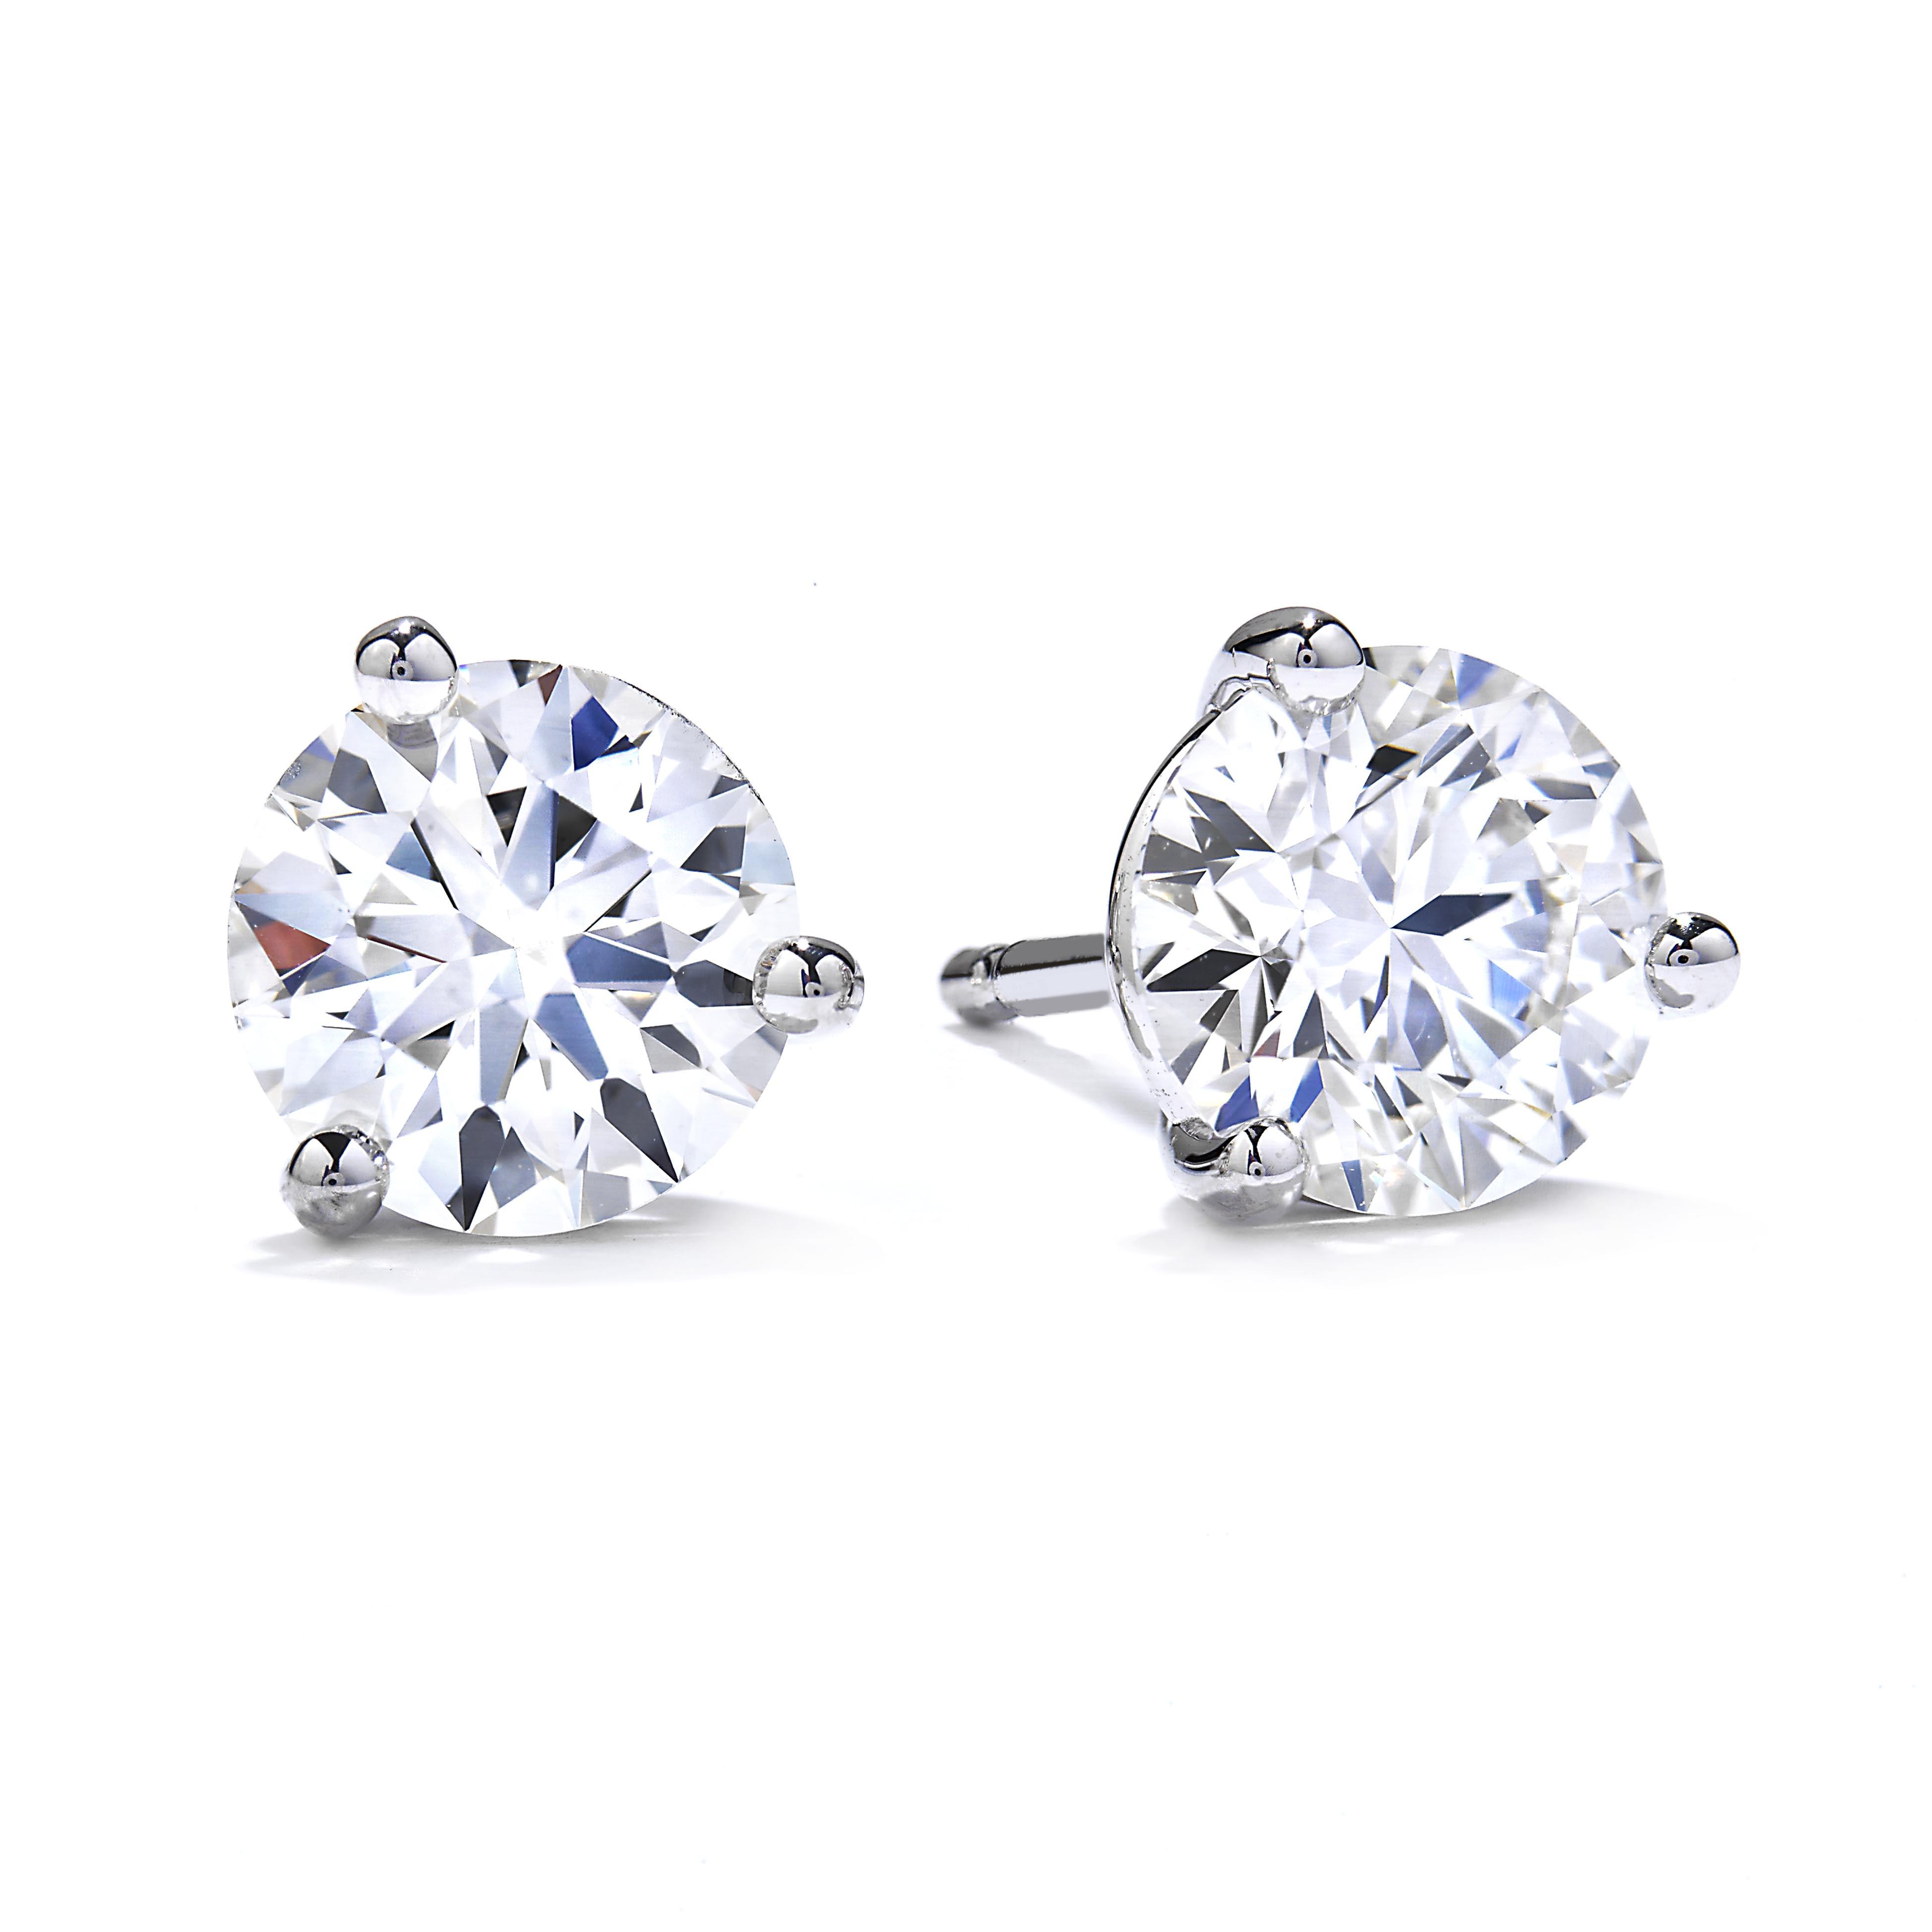 New Hearts On Fire® Serialized 1.023 CTW Diamond 3 Prong Stud Earrings